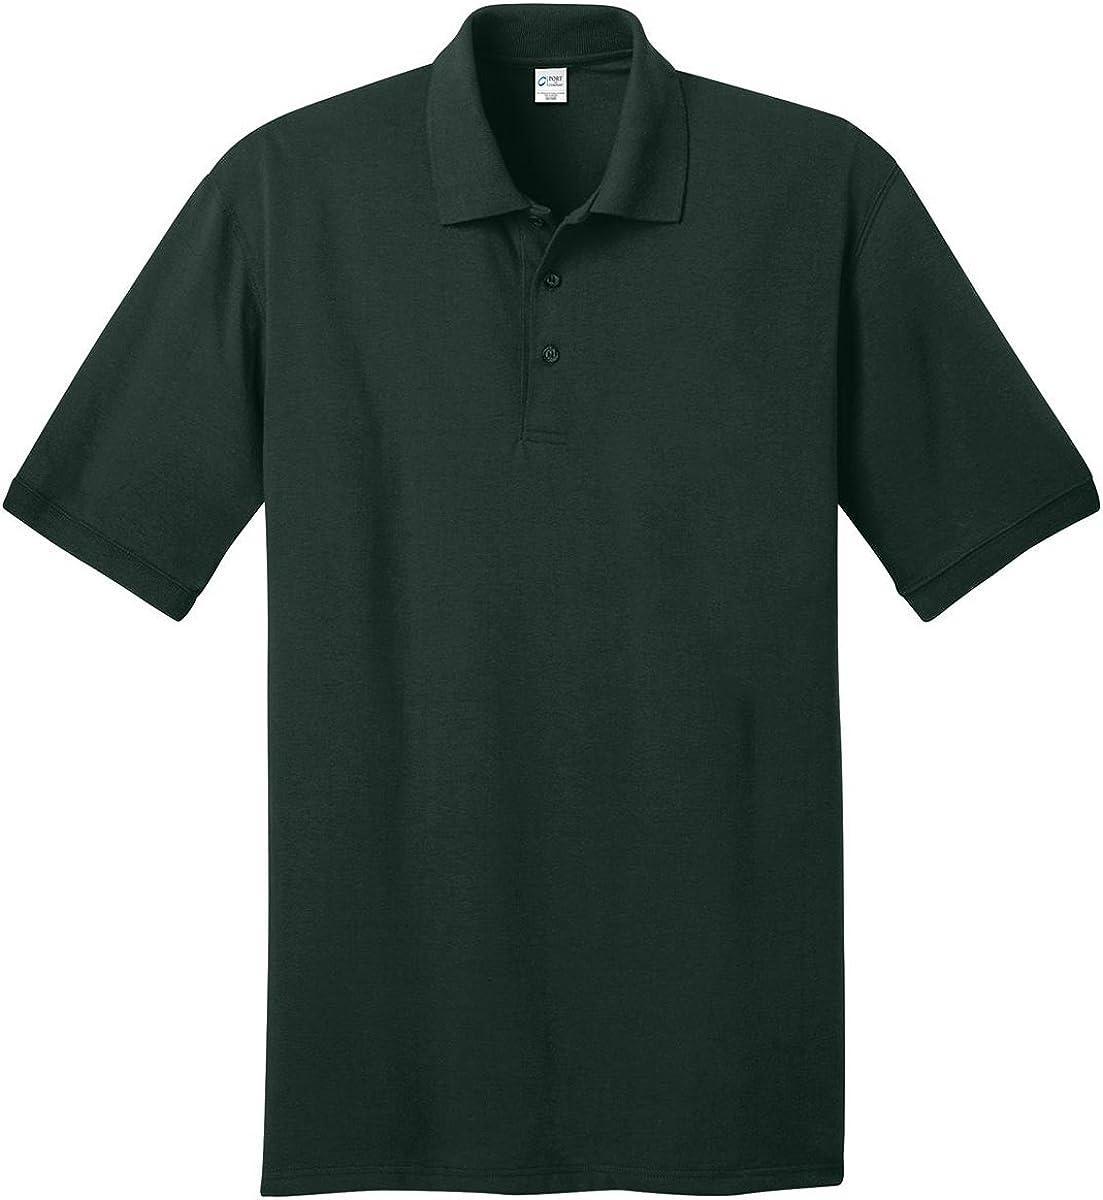 Port & Company Tall 5.5-Ounce Jersey Knit Polo Shirt, Dark Green, Large Tall